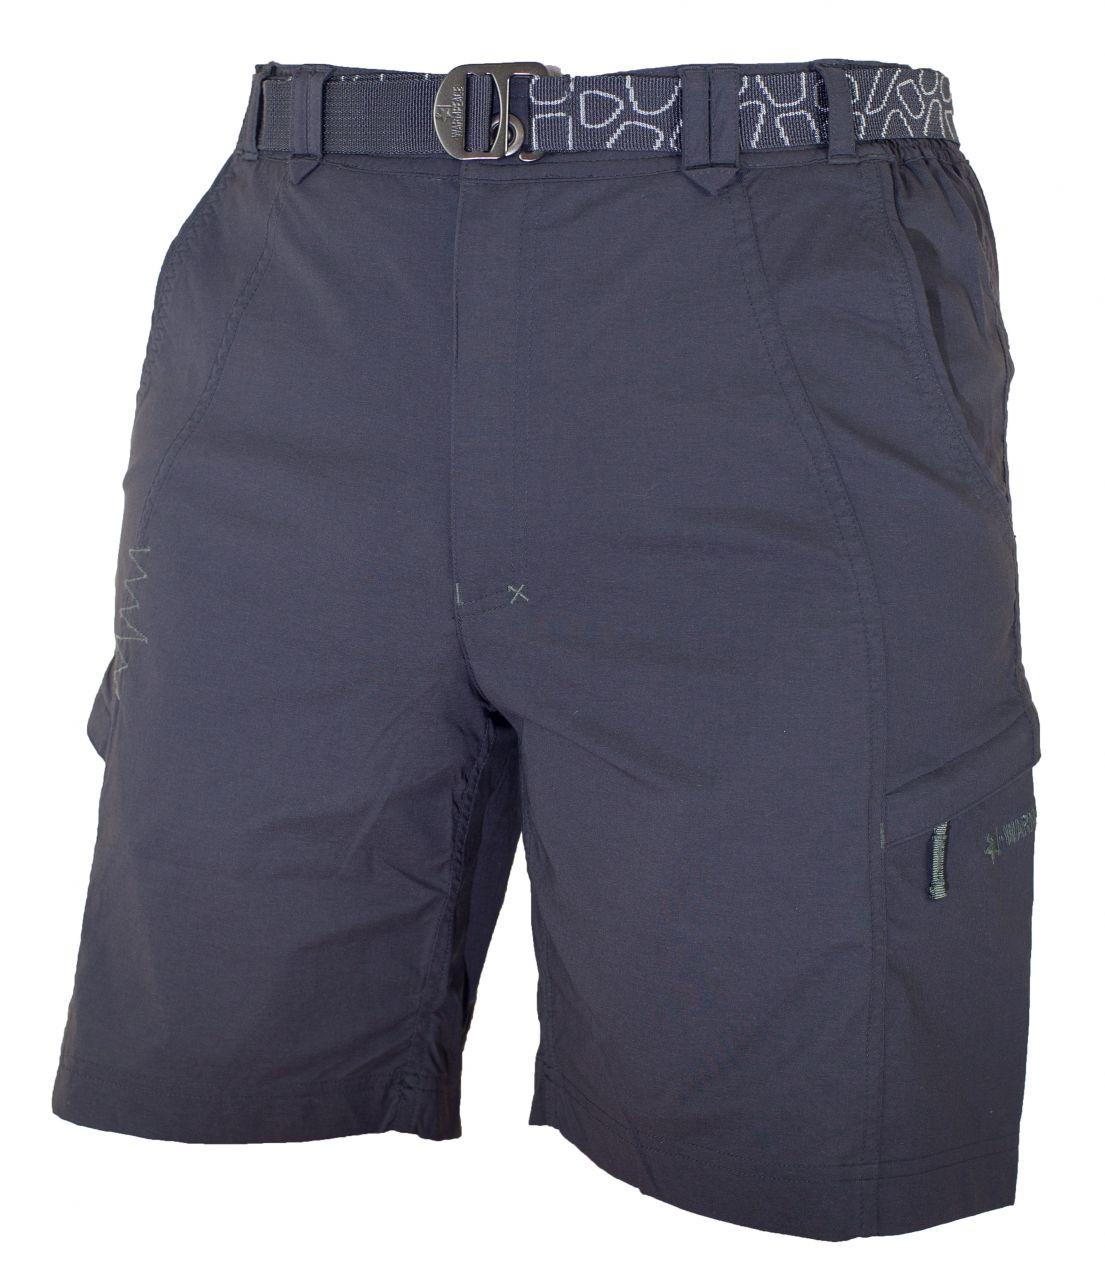 Warmpeace Corsair Shorts iron S